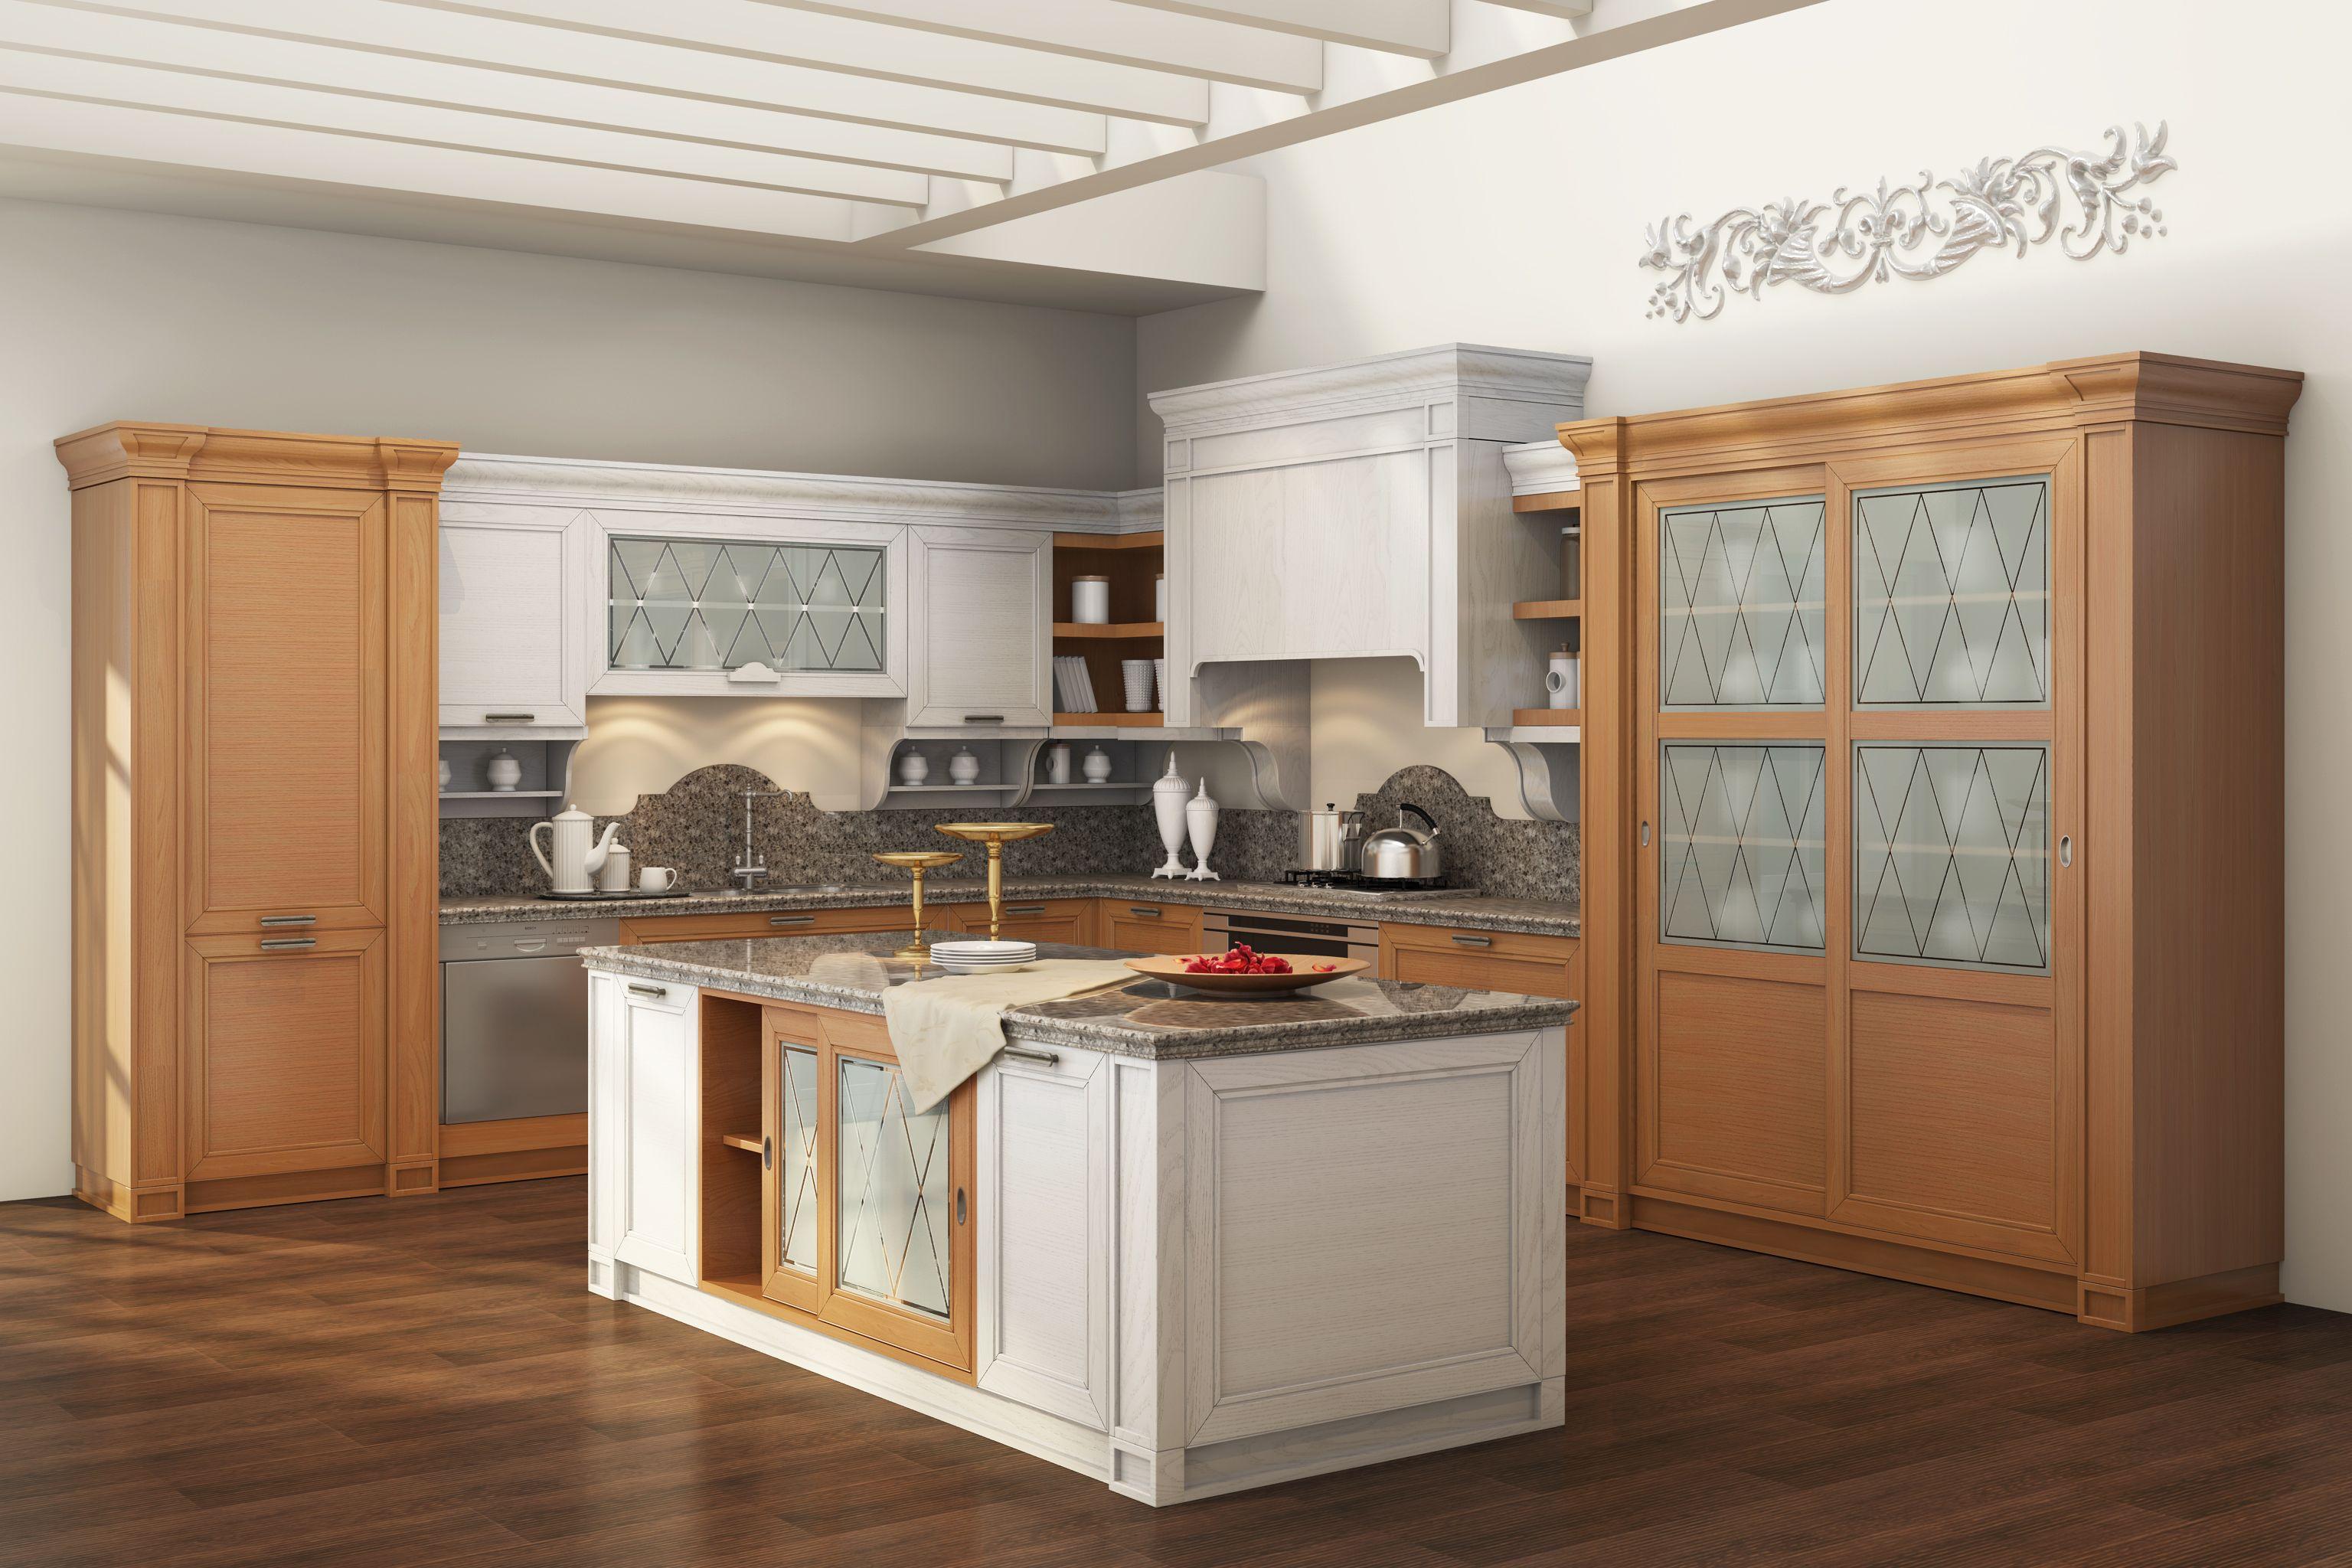 Continental Cabinet Decorative Effect Cabinet Kitchen Cabinets Kitchen Cabinet Manufacturers